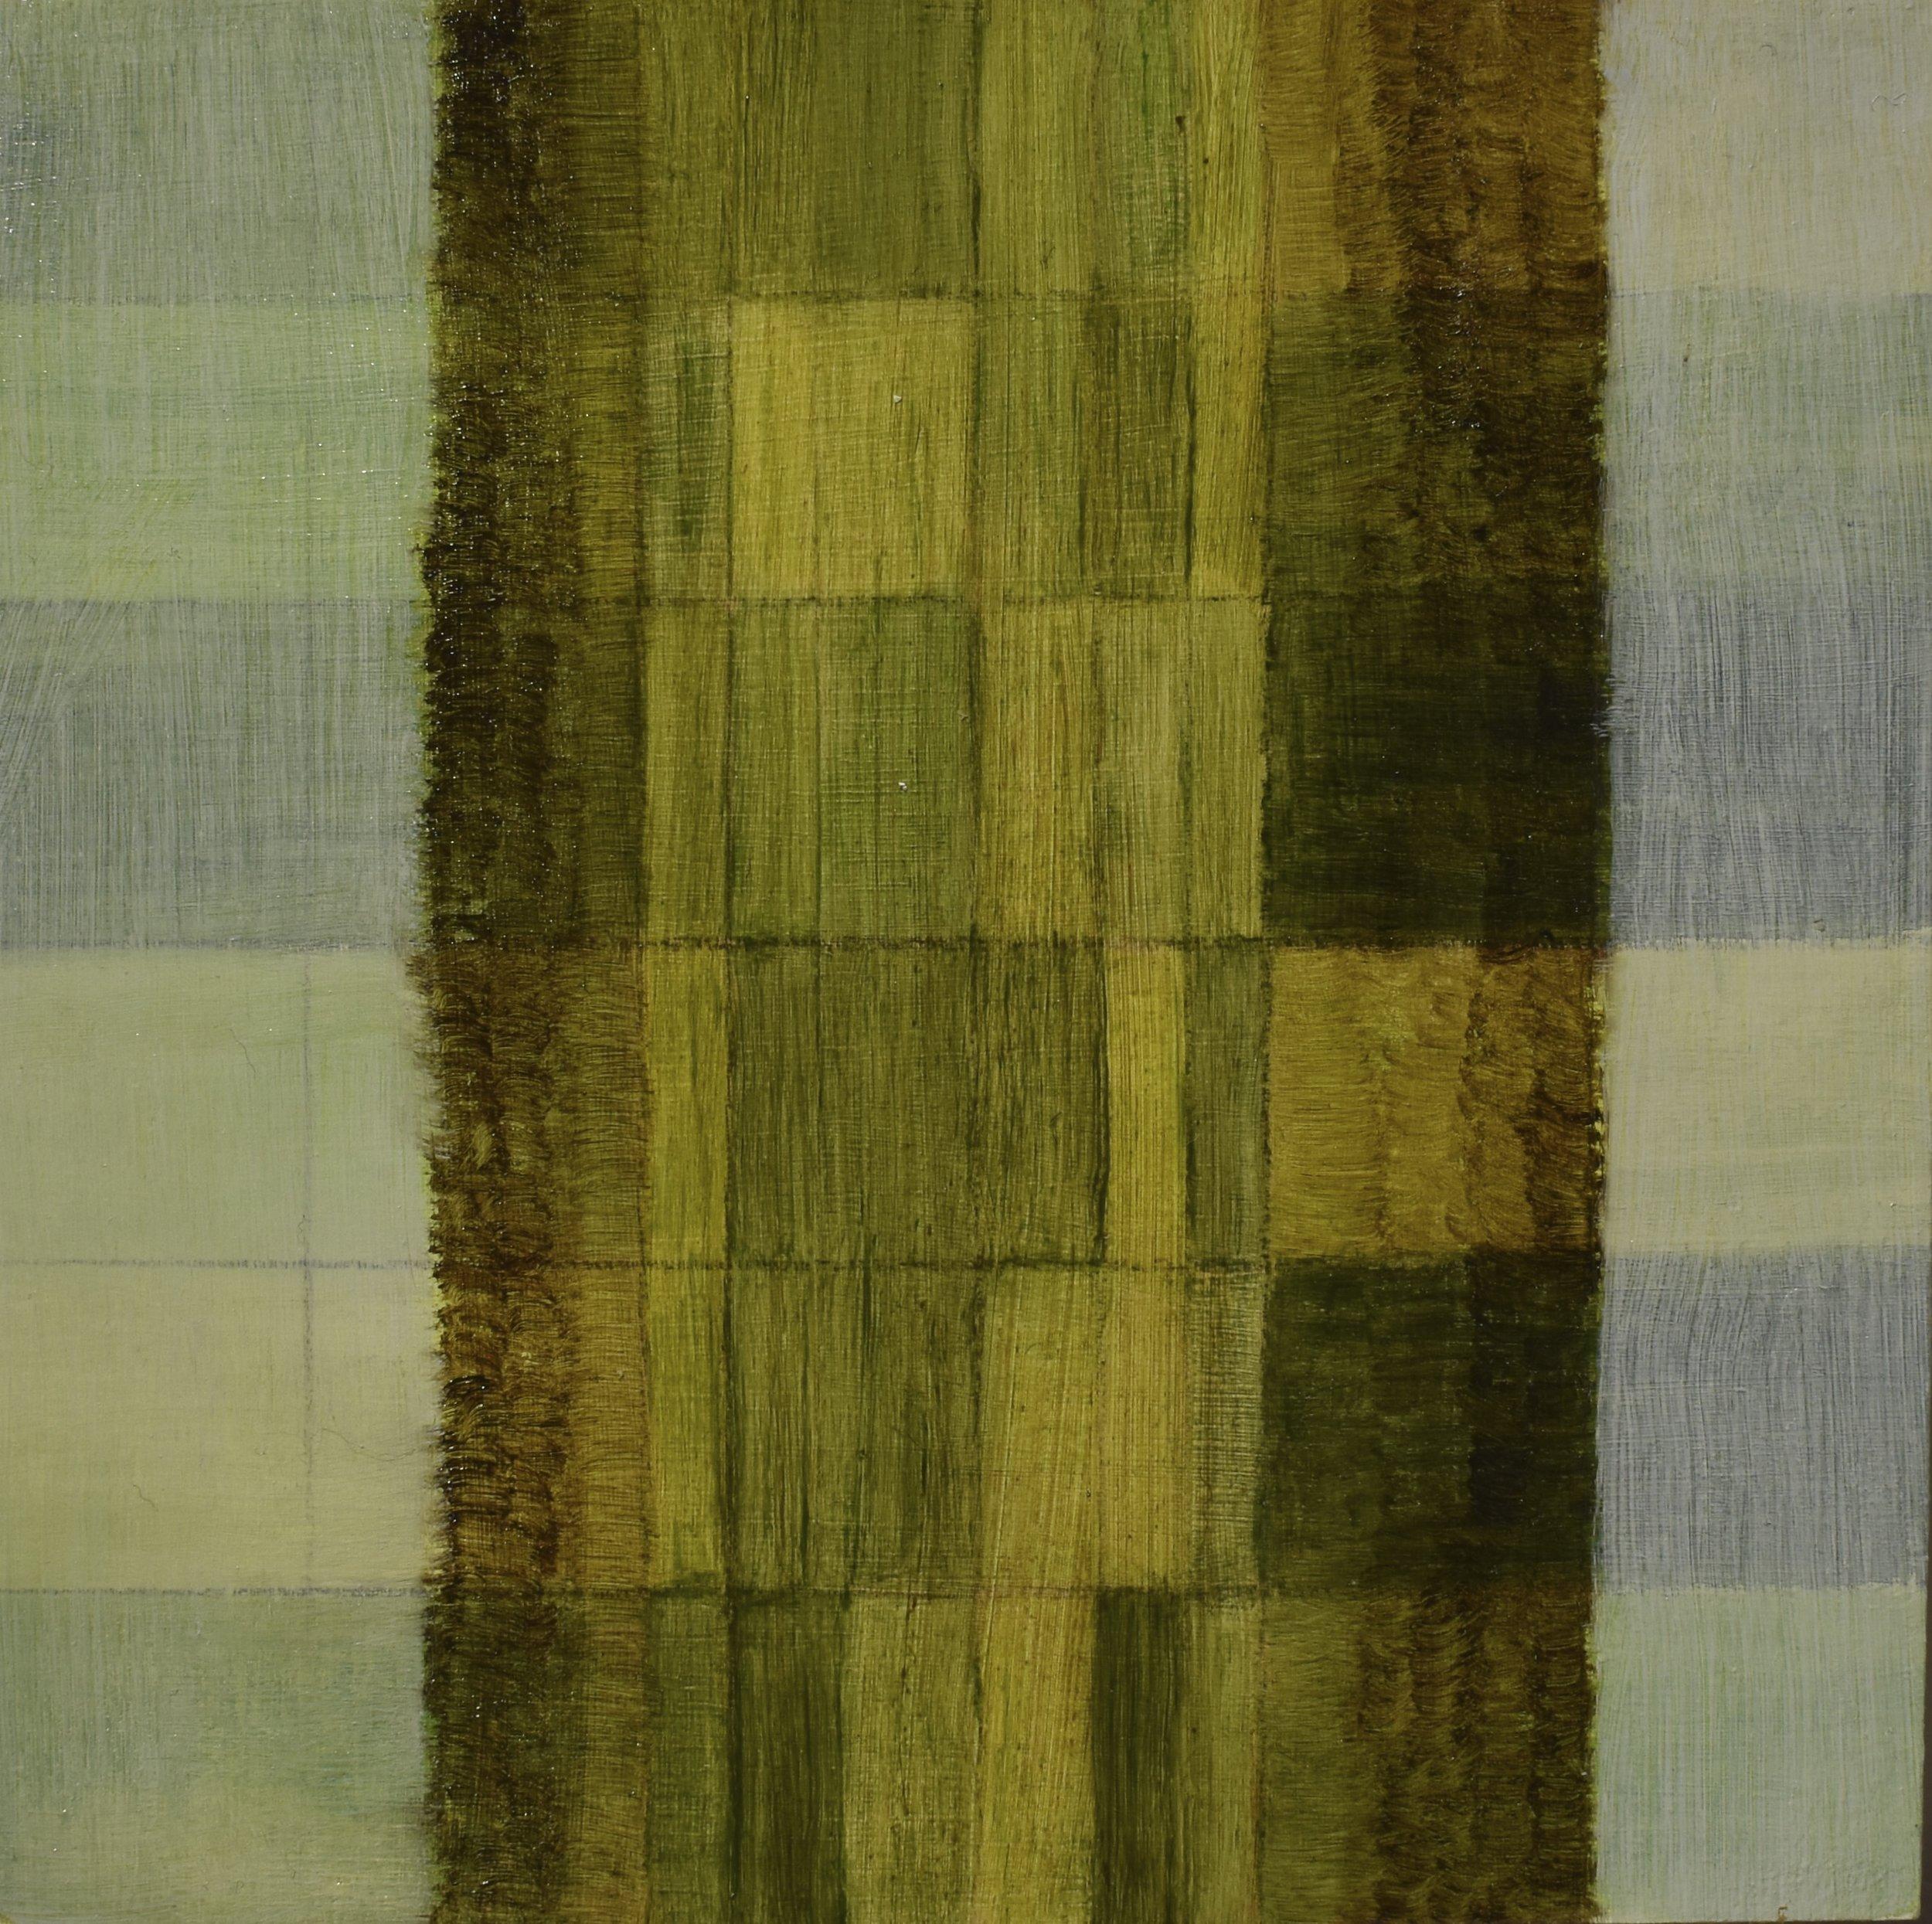 tillage, 2017 oil on wood panel, 15 x 15 cm